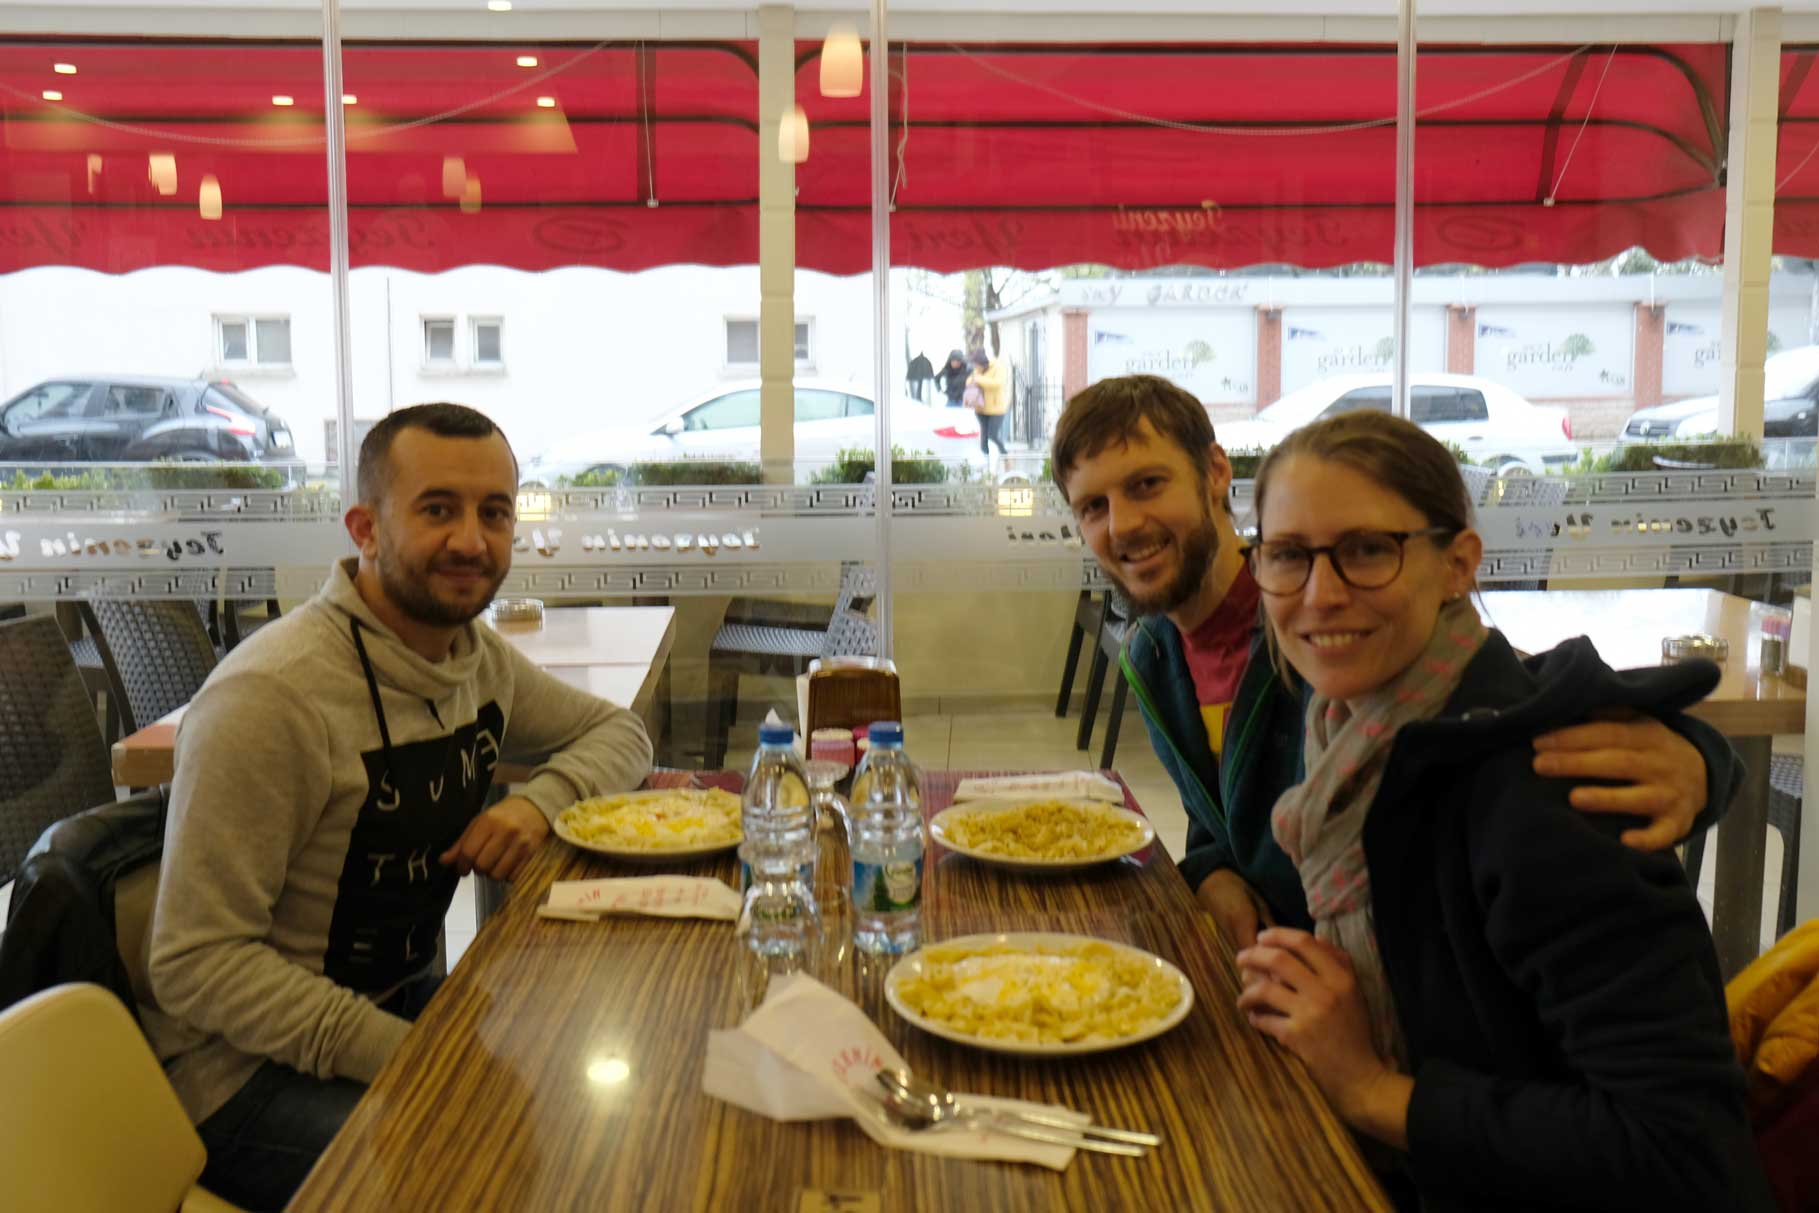 Fatih, Sebastian und Leo essen Manti